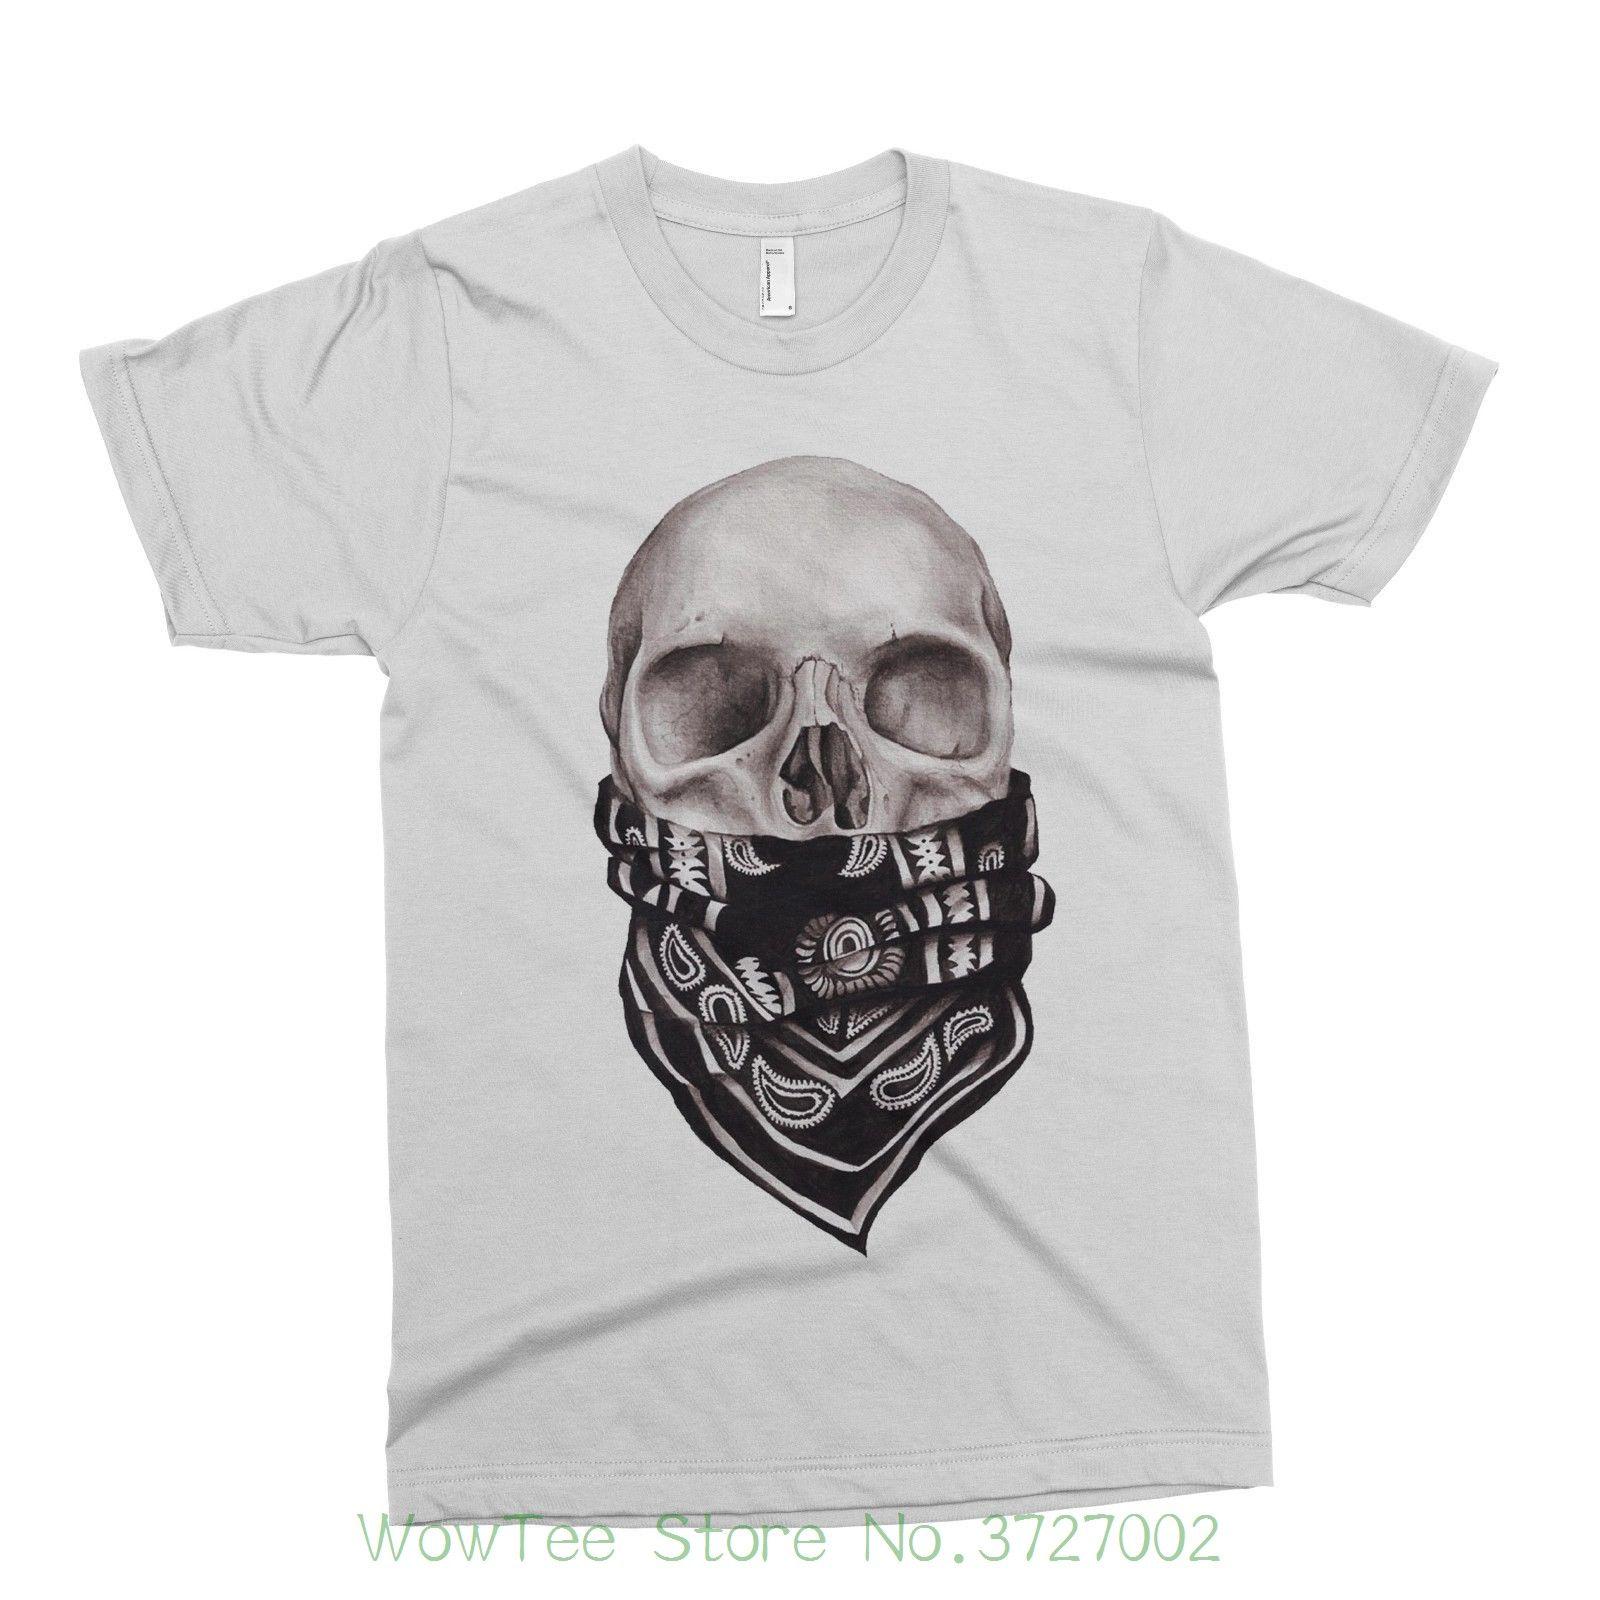 8d86fe0b5 Ribelle Skull T Shirt Tattoo Alternativa Goccia Dead Abandon Nave Ark Circo  Summer Style Hip Hop Men T Shirt Tops Retro Shirts Awesome Shirts From ...